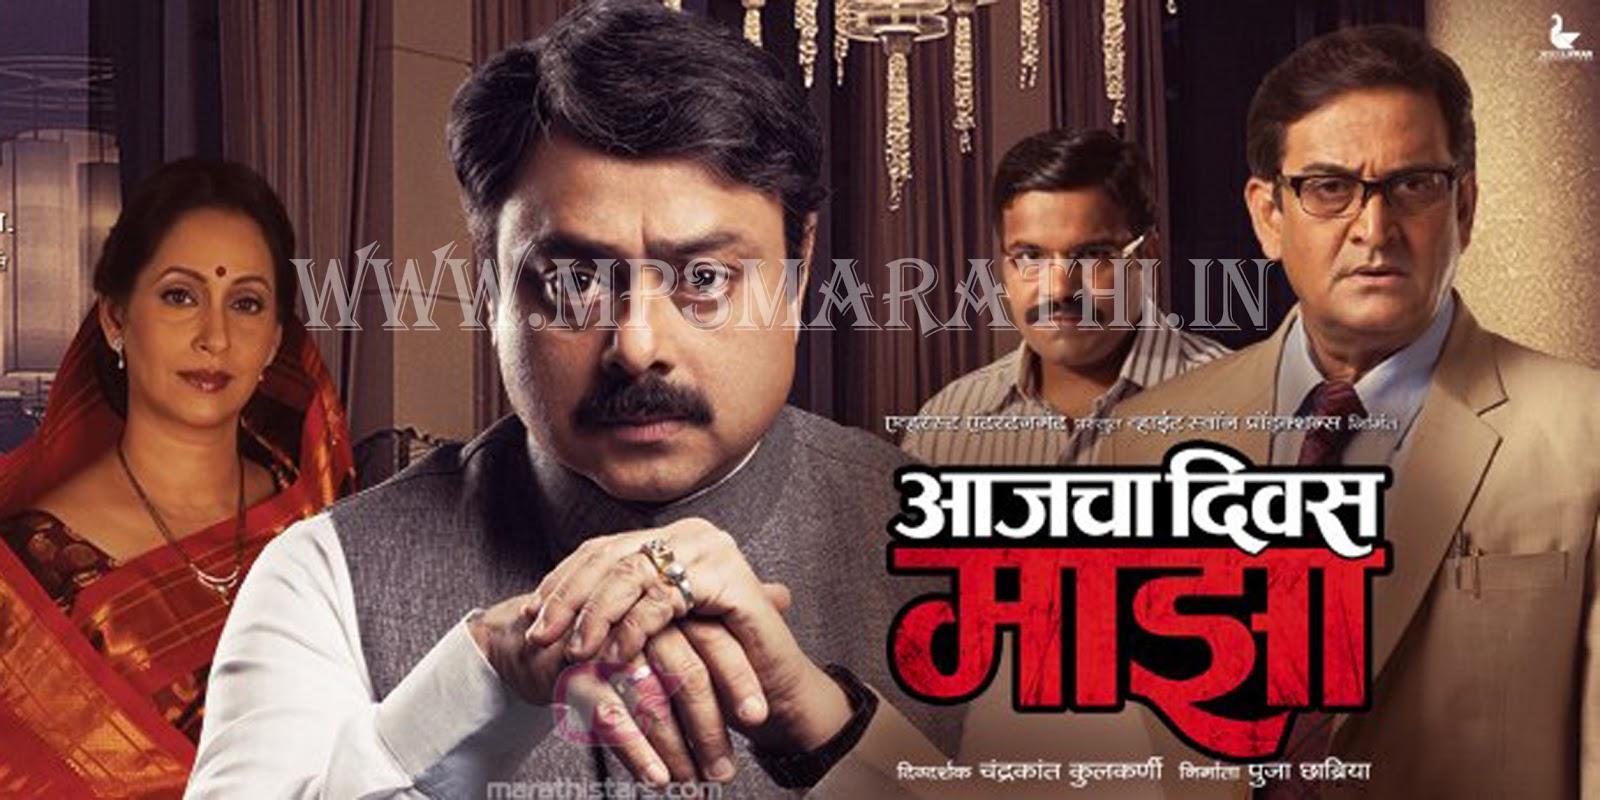 😍 New marathi movie song download 2017 | new marathi movies